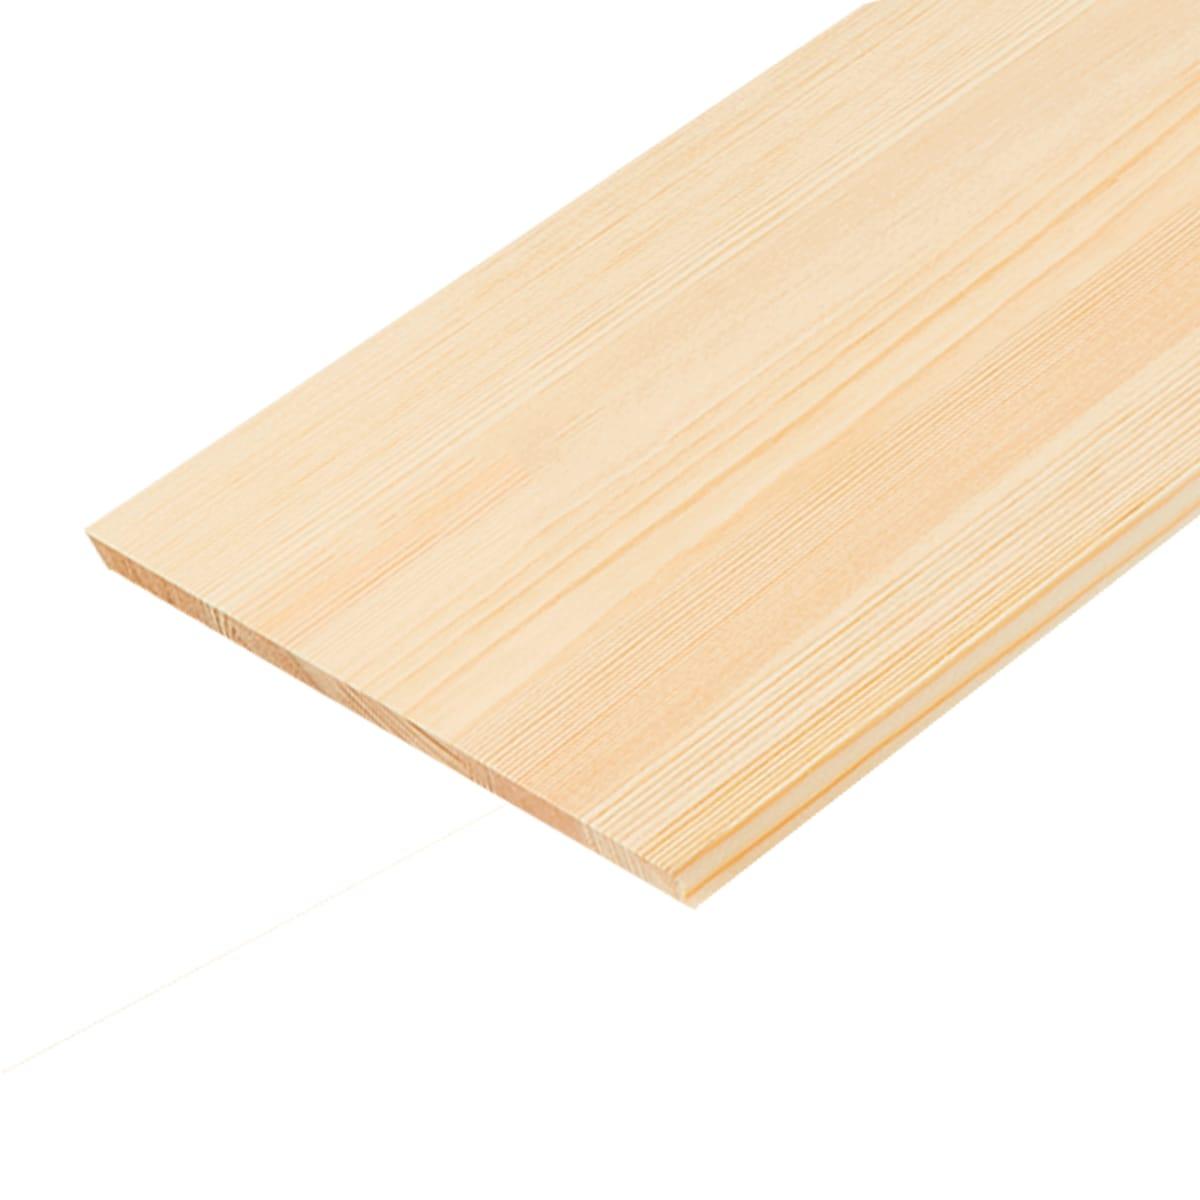 Панель деревянная экстра 11х200х1500 мм